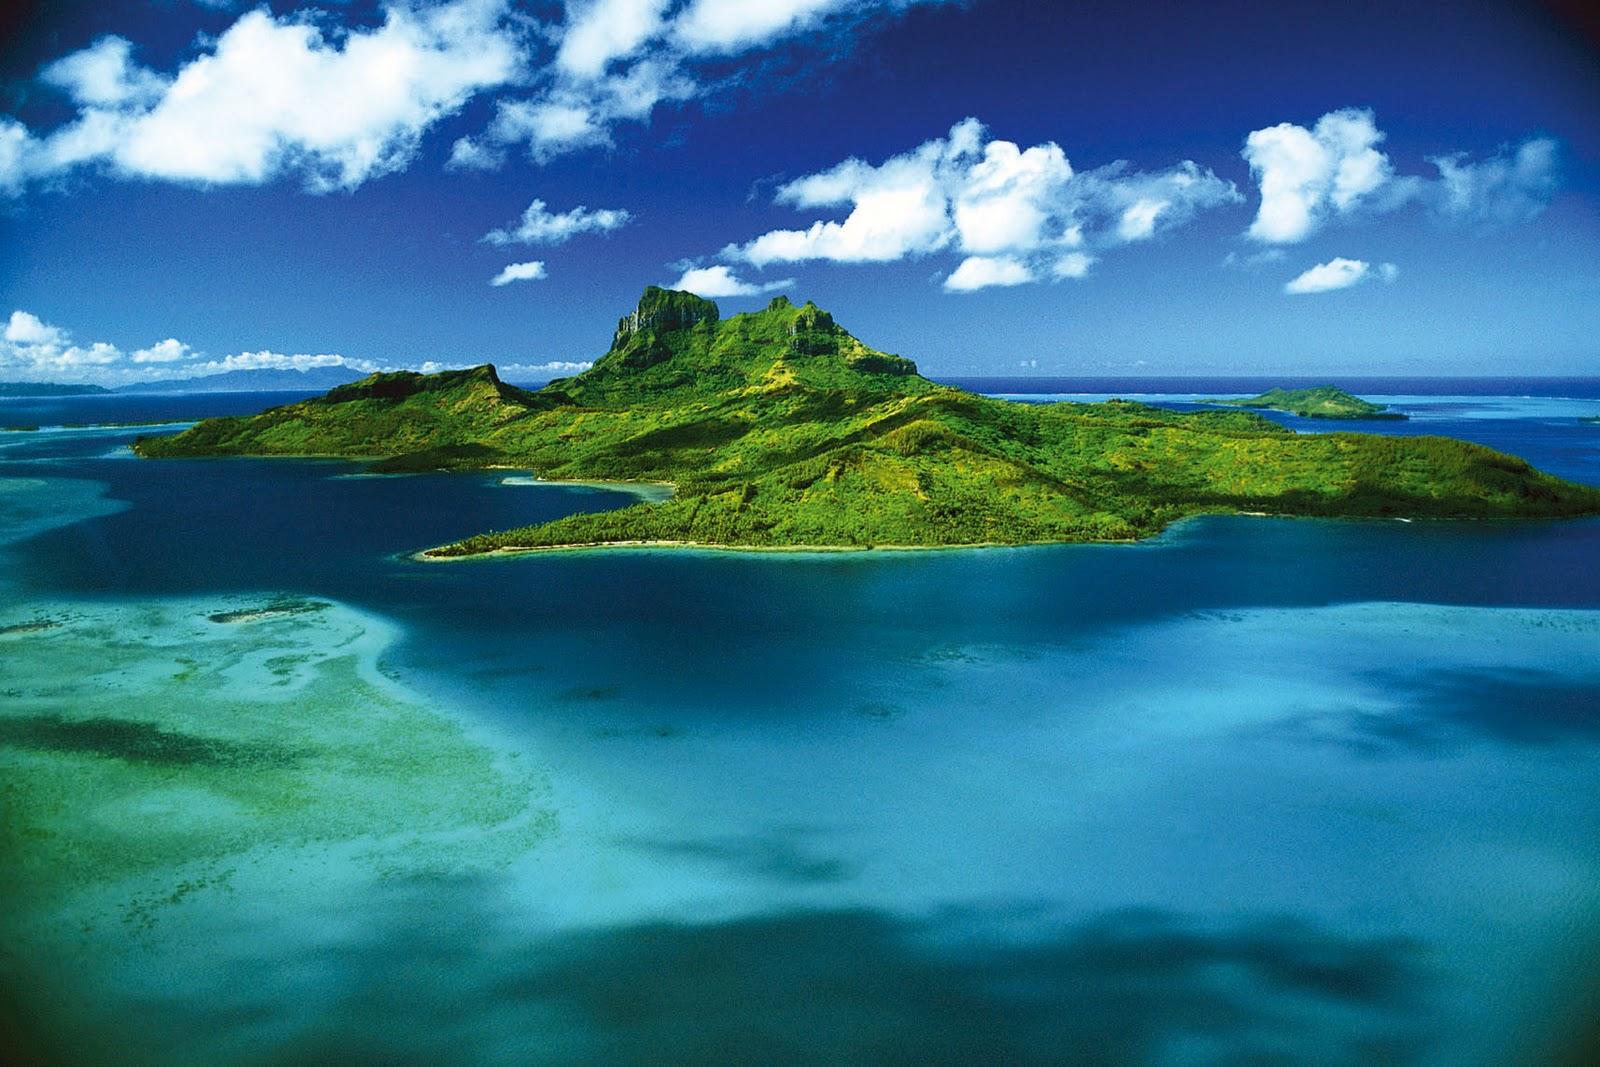 Phoebettmh Travel: (Tahiti) – Bora Bora Island - Pearl of the ...: http://phoebettmh.blogspot.com/2012/02/tahiti-bora-bora-island-pearl-of.html